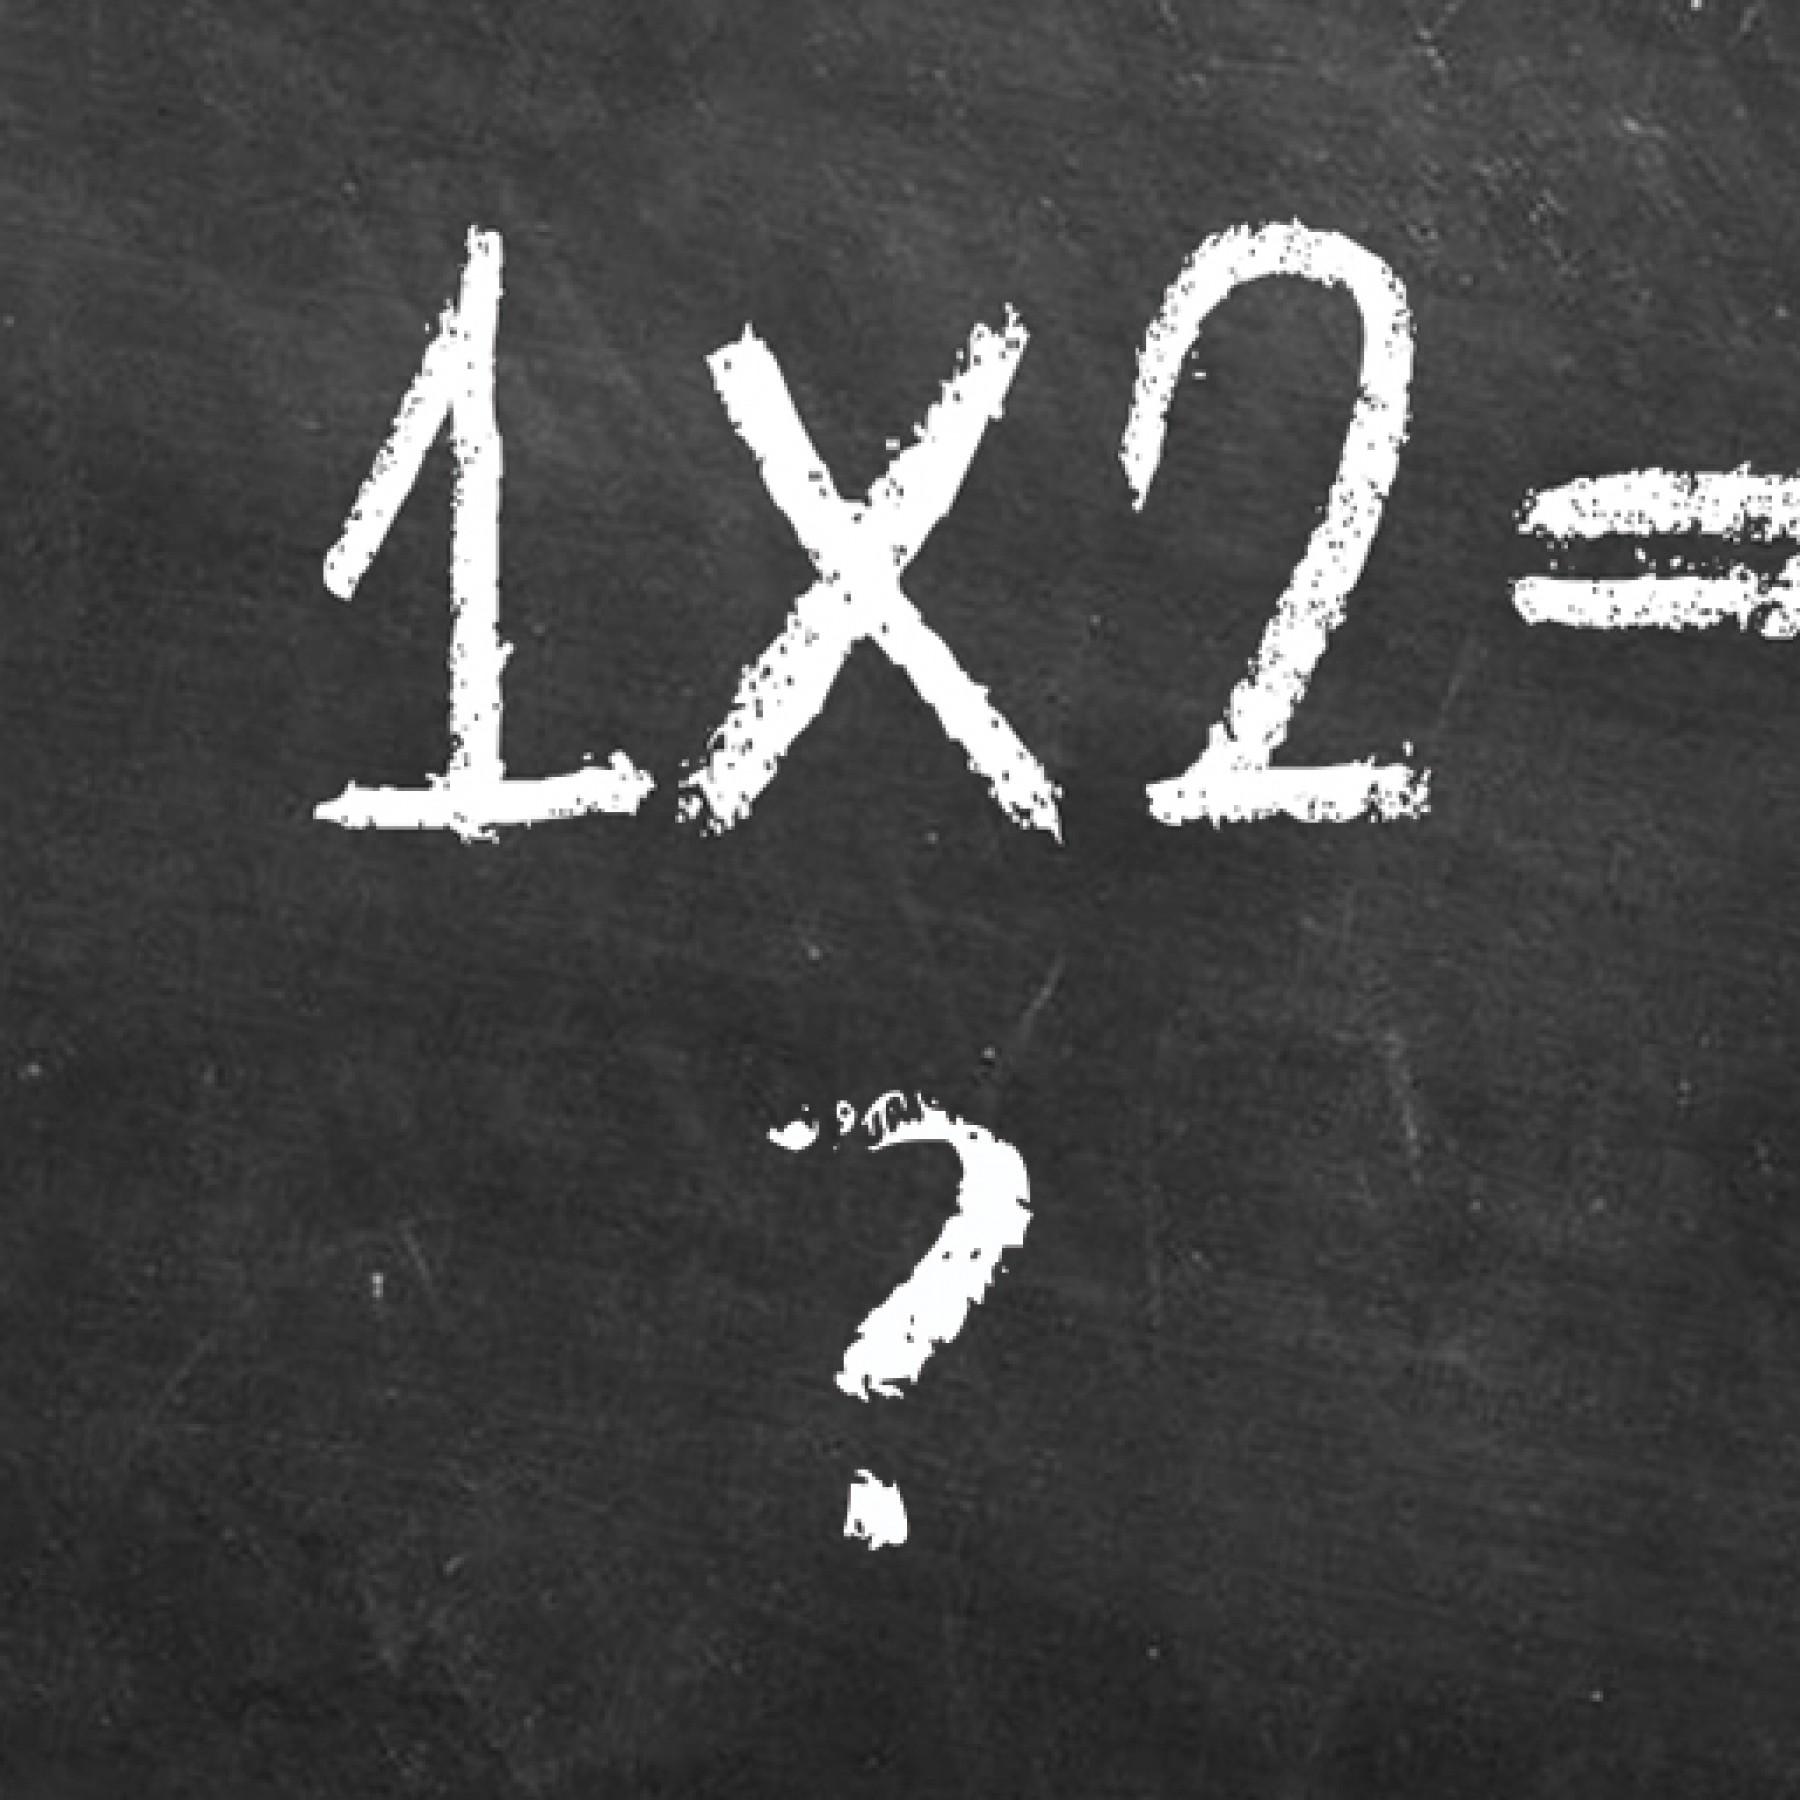 maths-quiz-games-quiz-kids-education-main-location1